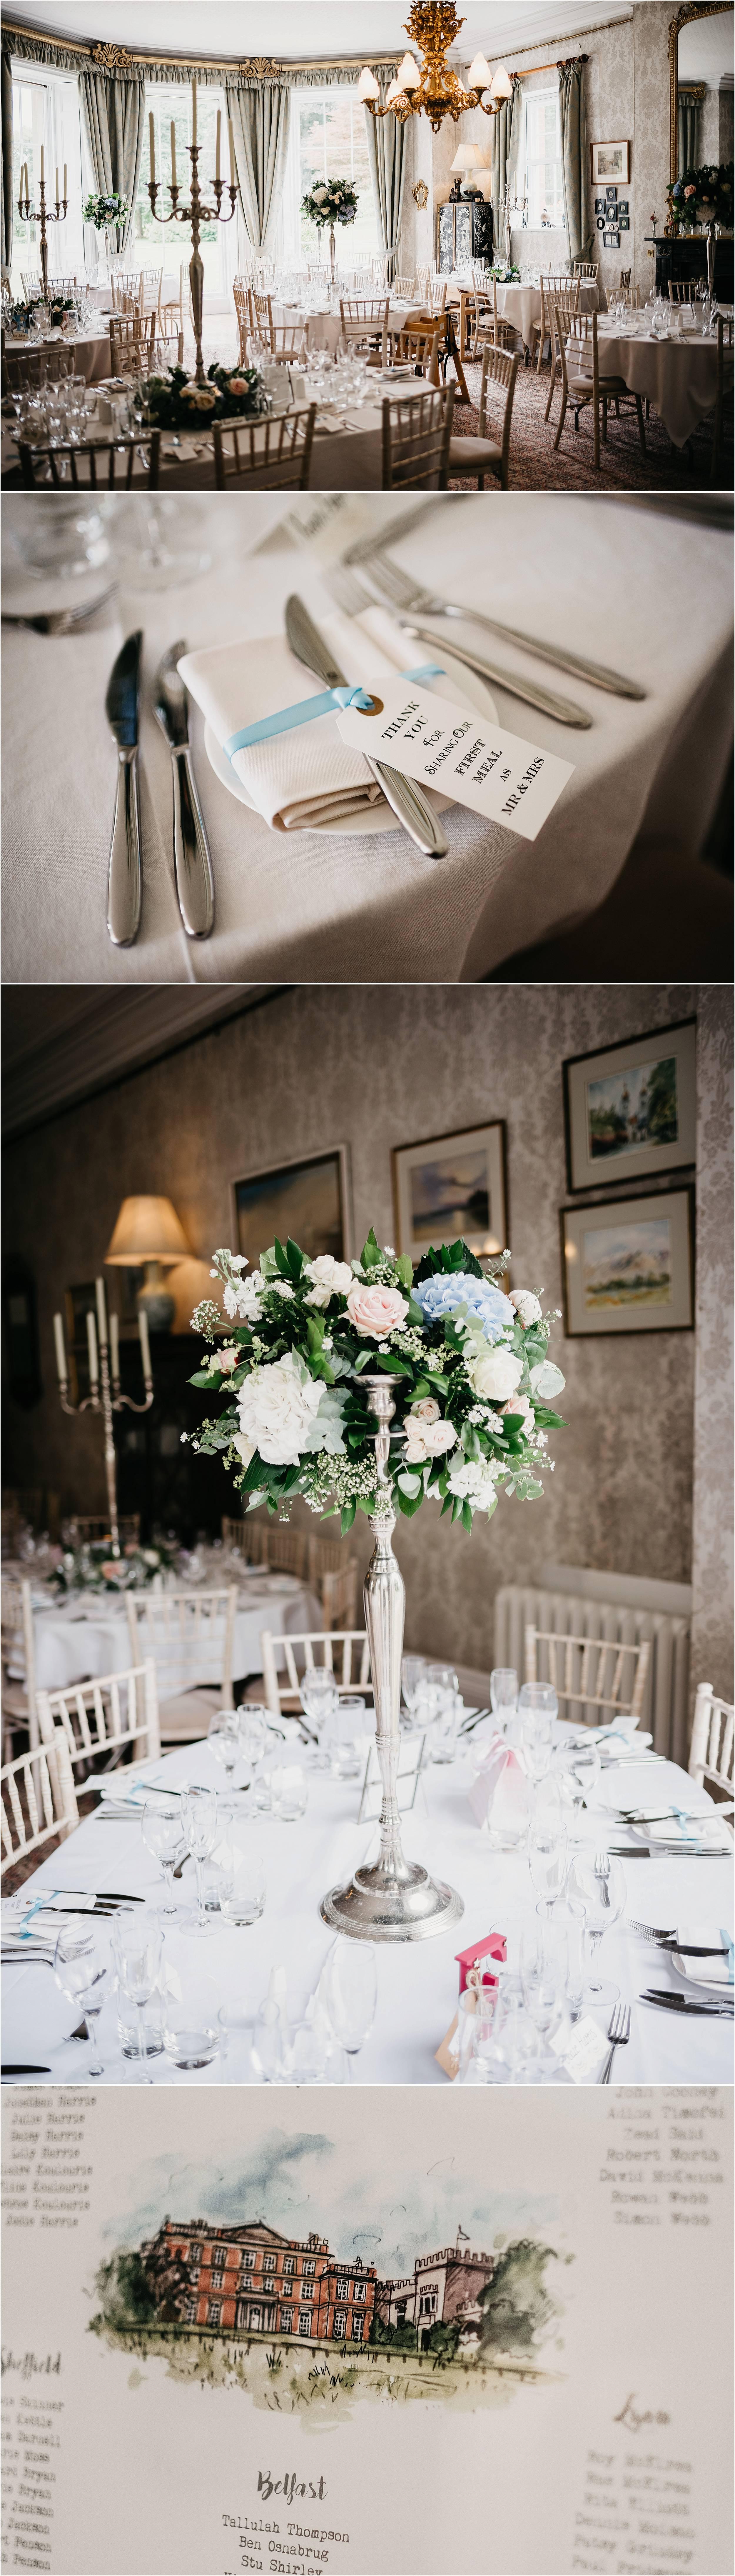 Herefordshire Wedding Photographer_0016.jpg